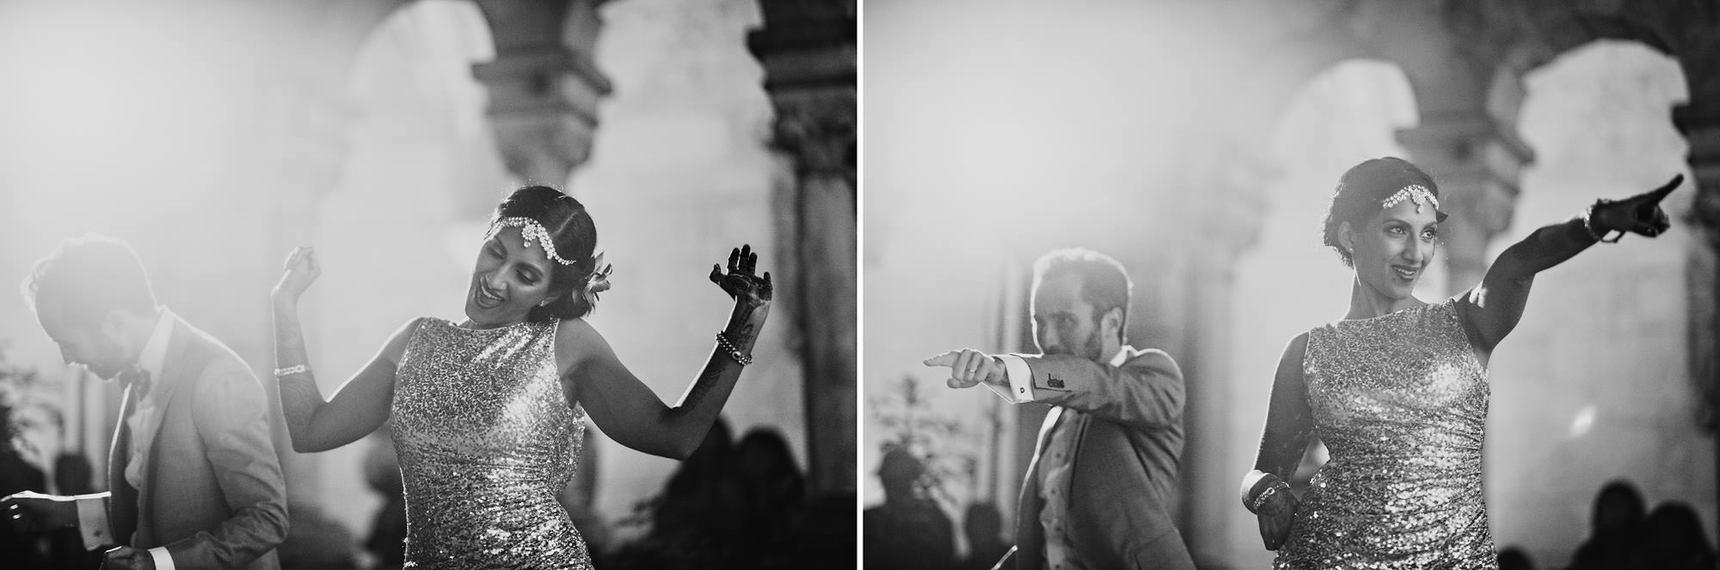 miami-luxury-catering-Wedding-Photography-91(pp_w1720_h570).jpg